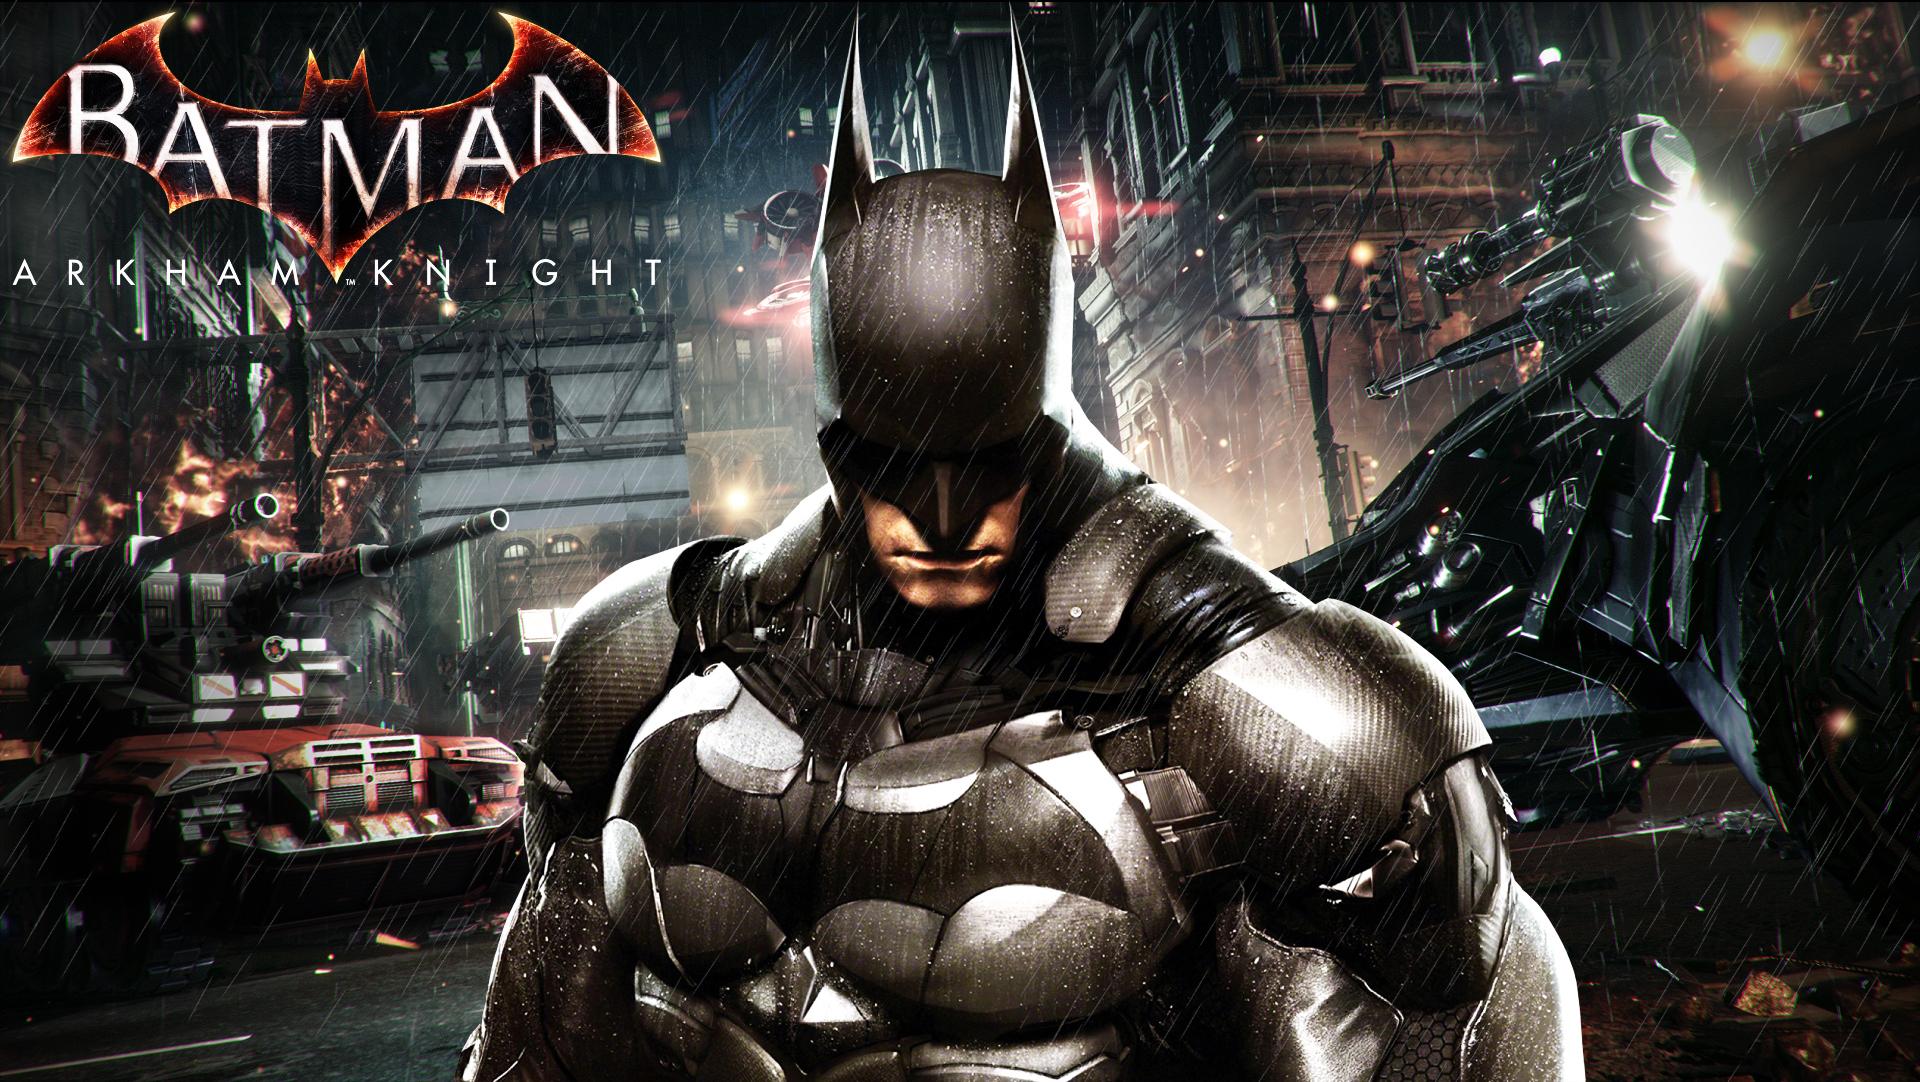 Batman Arkham Knight Hd Wallpaper 1 By Rajivcr7 On Deviantart